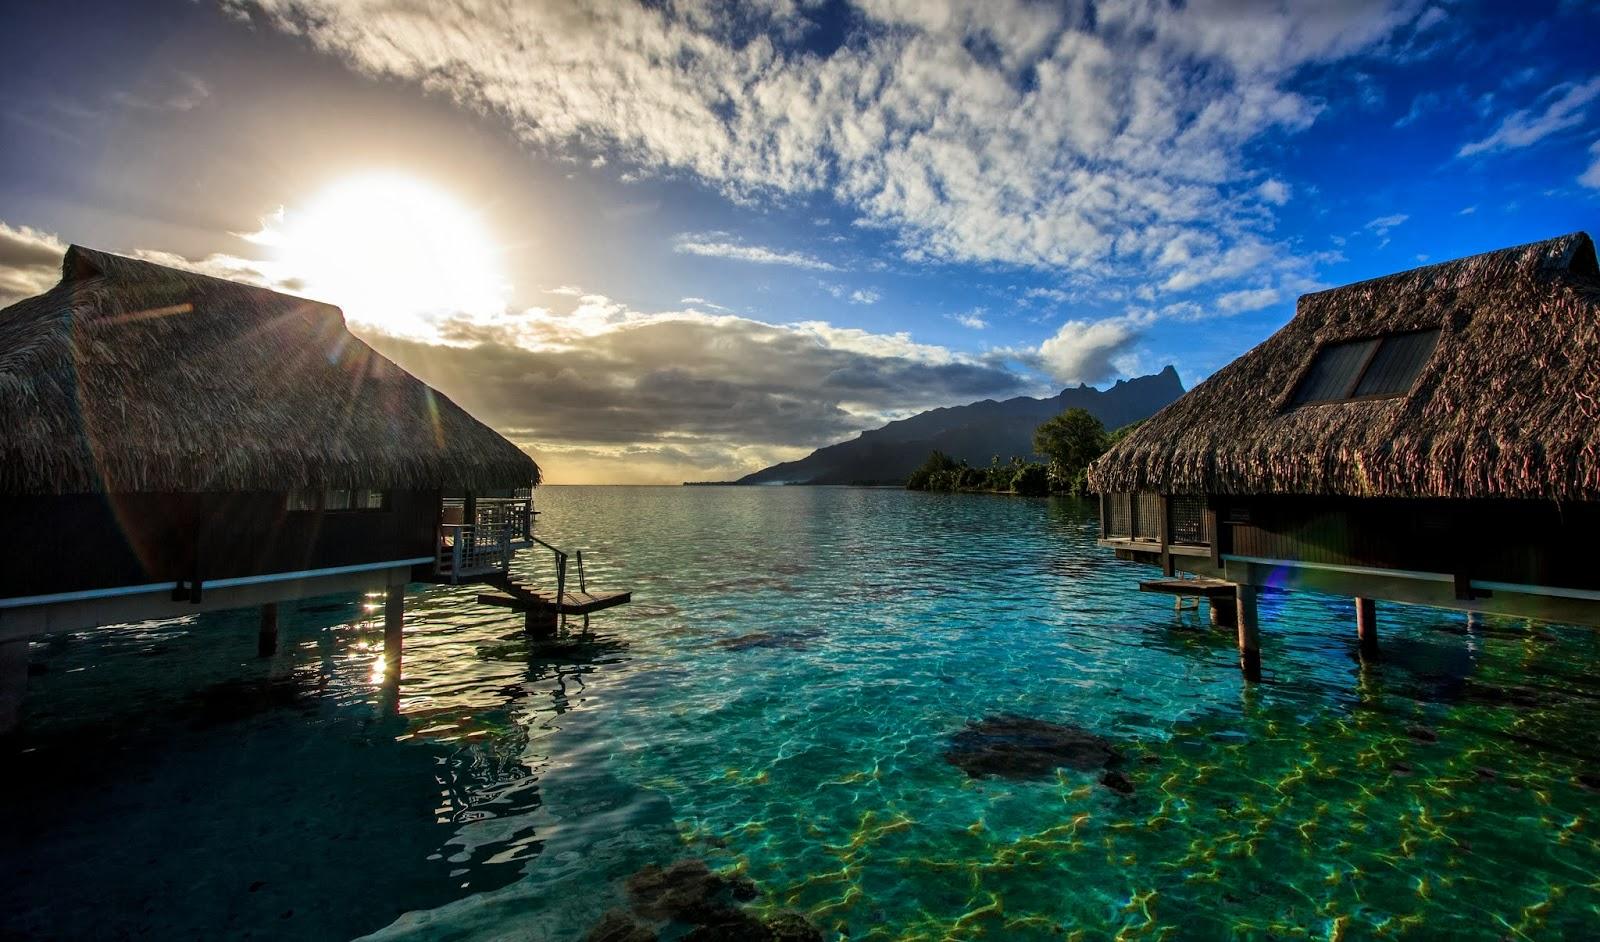 Tahiti French Polynesia  city photos gallery : ... French Polynesia, Pacific Papeete, Tahiti, Mo'orea, Bora Bora